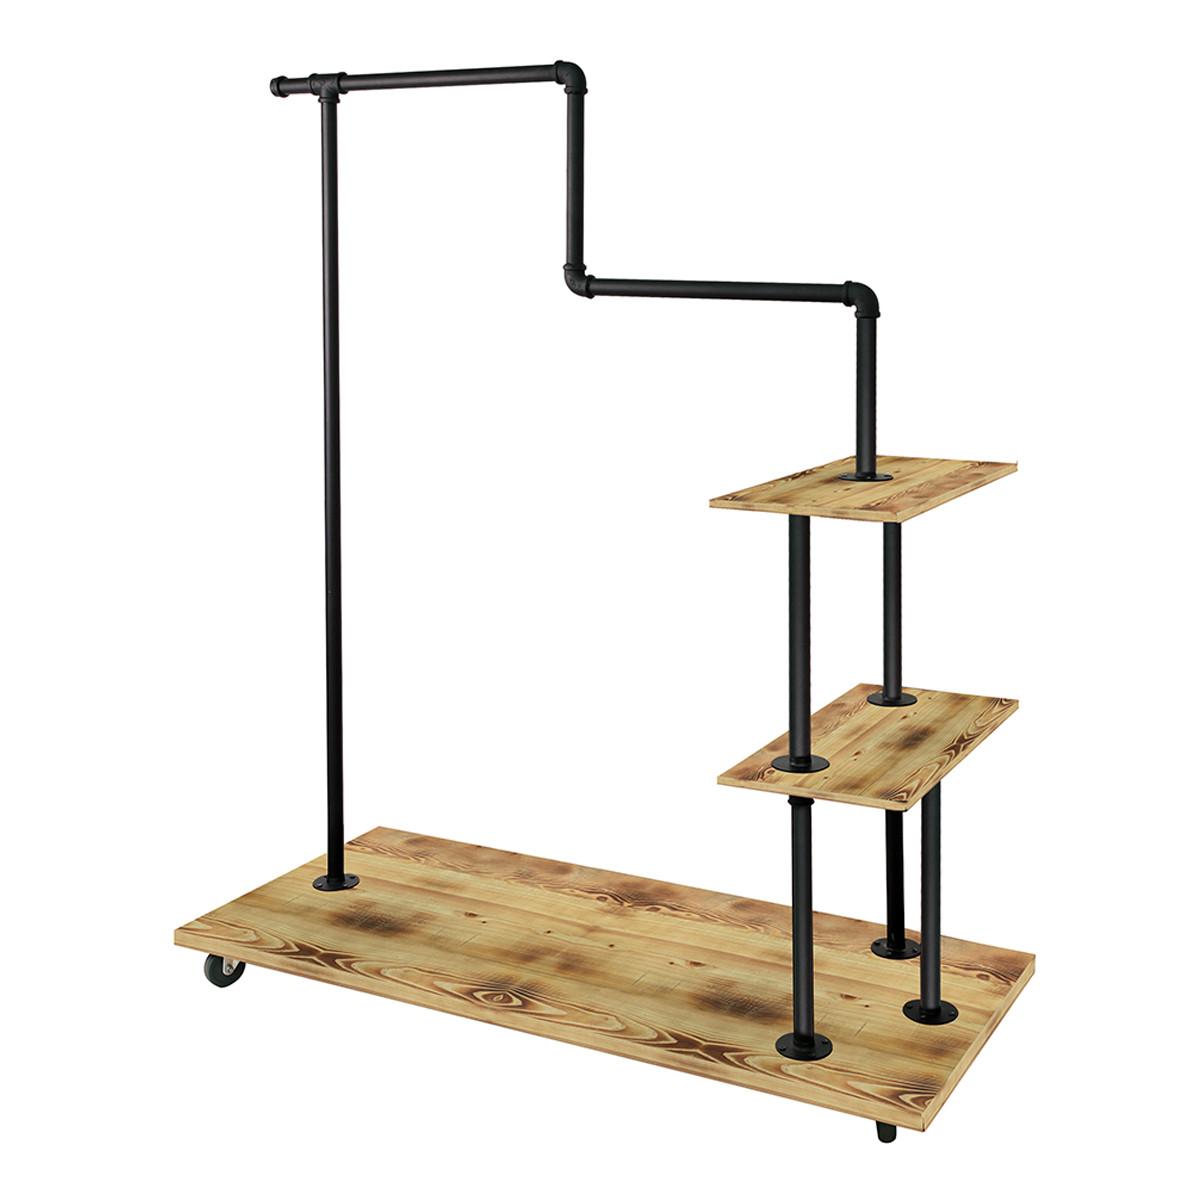 black ideas galvanized clothing furniture design interior rack amazing simple at in luxury best pipe home